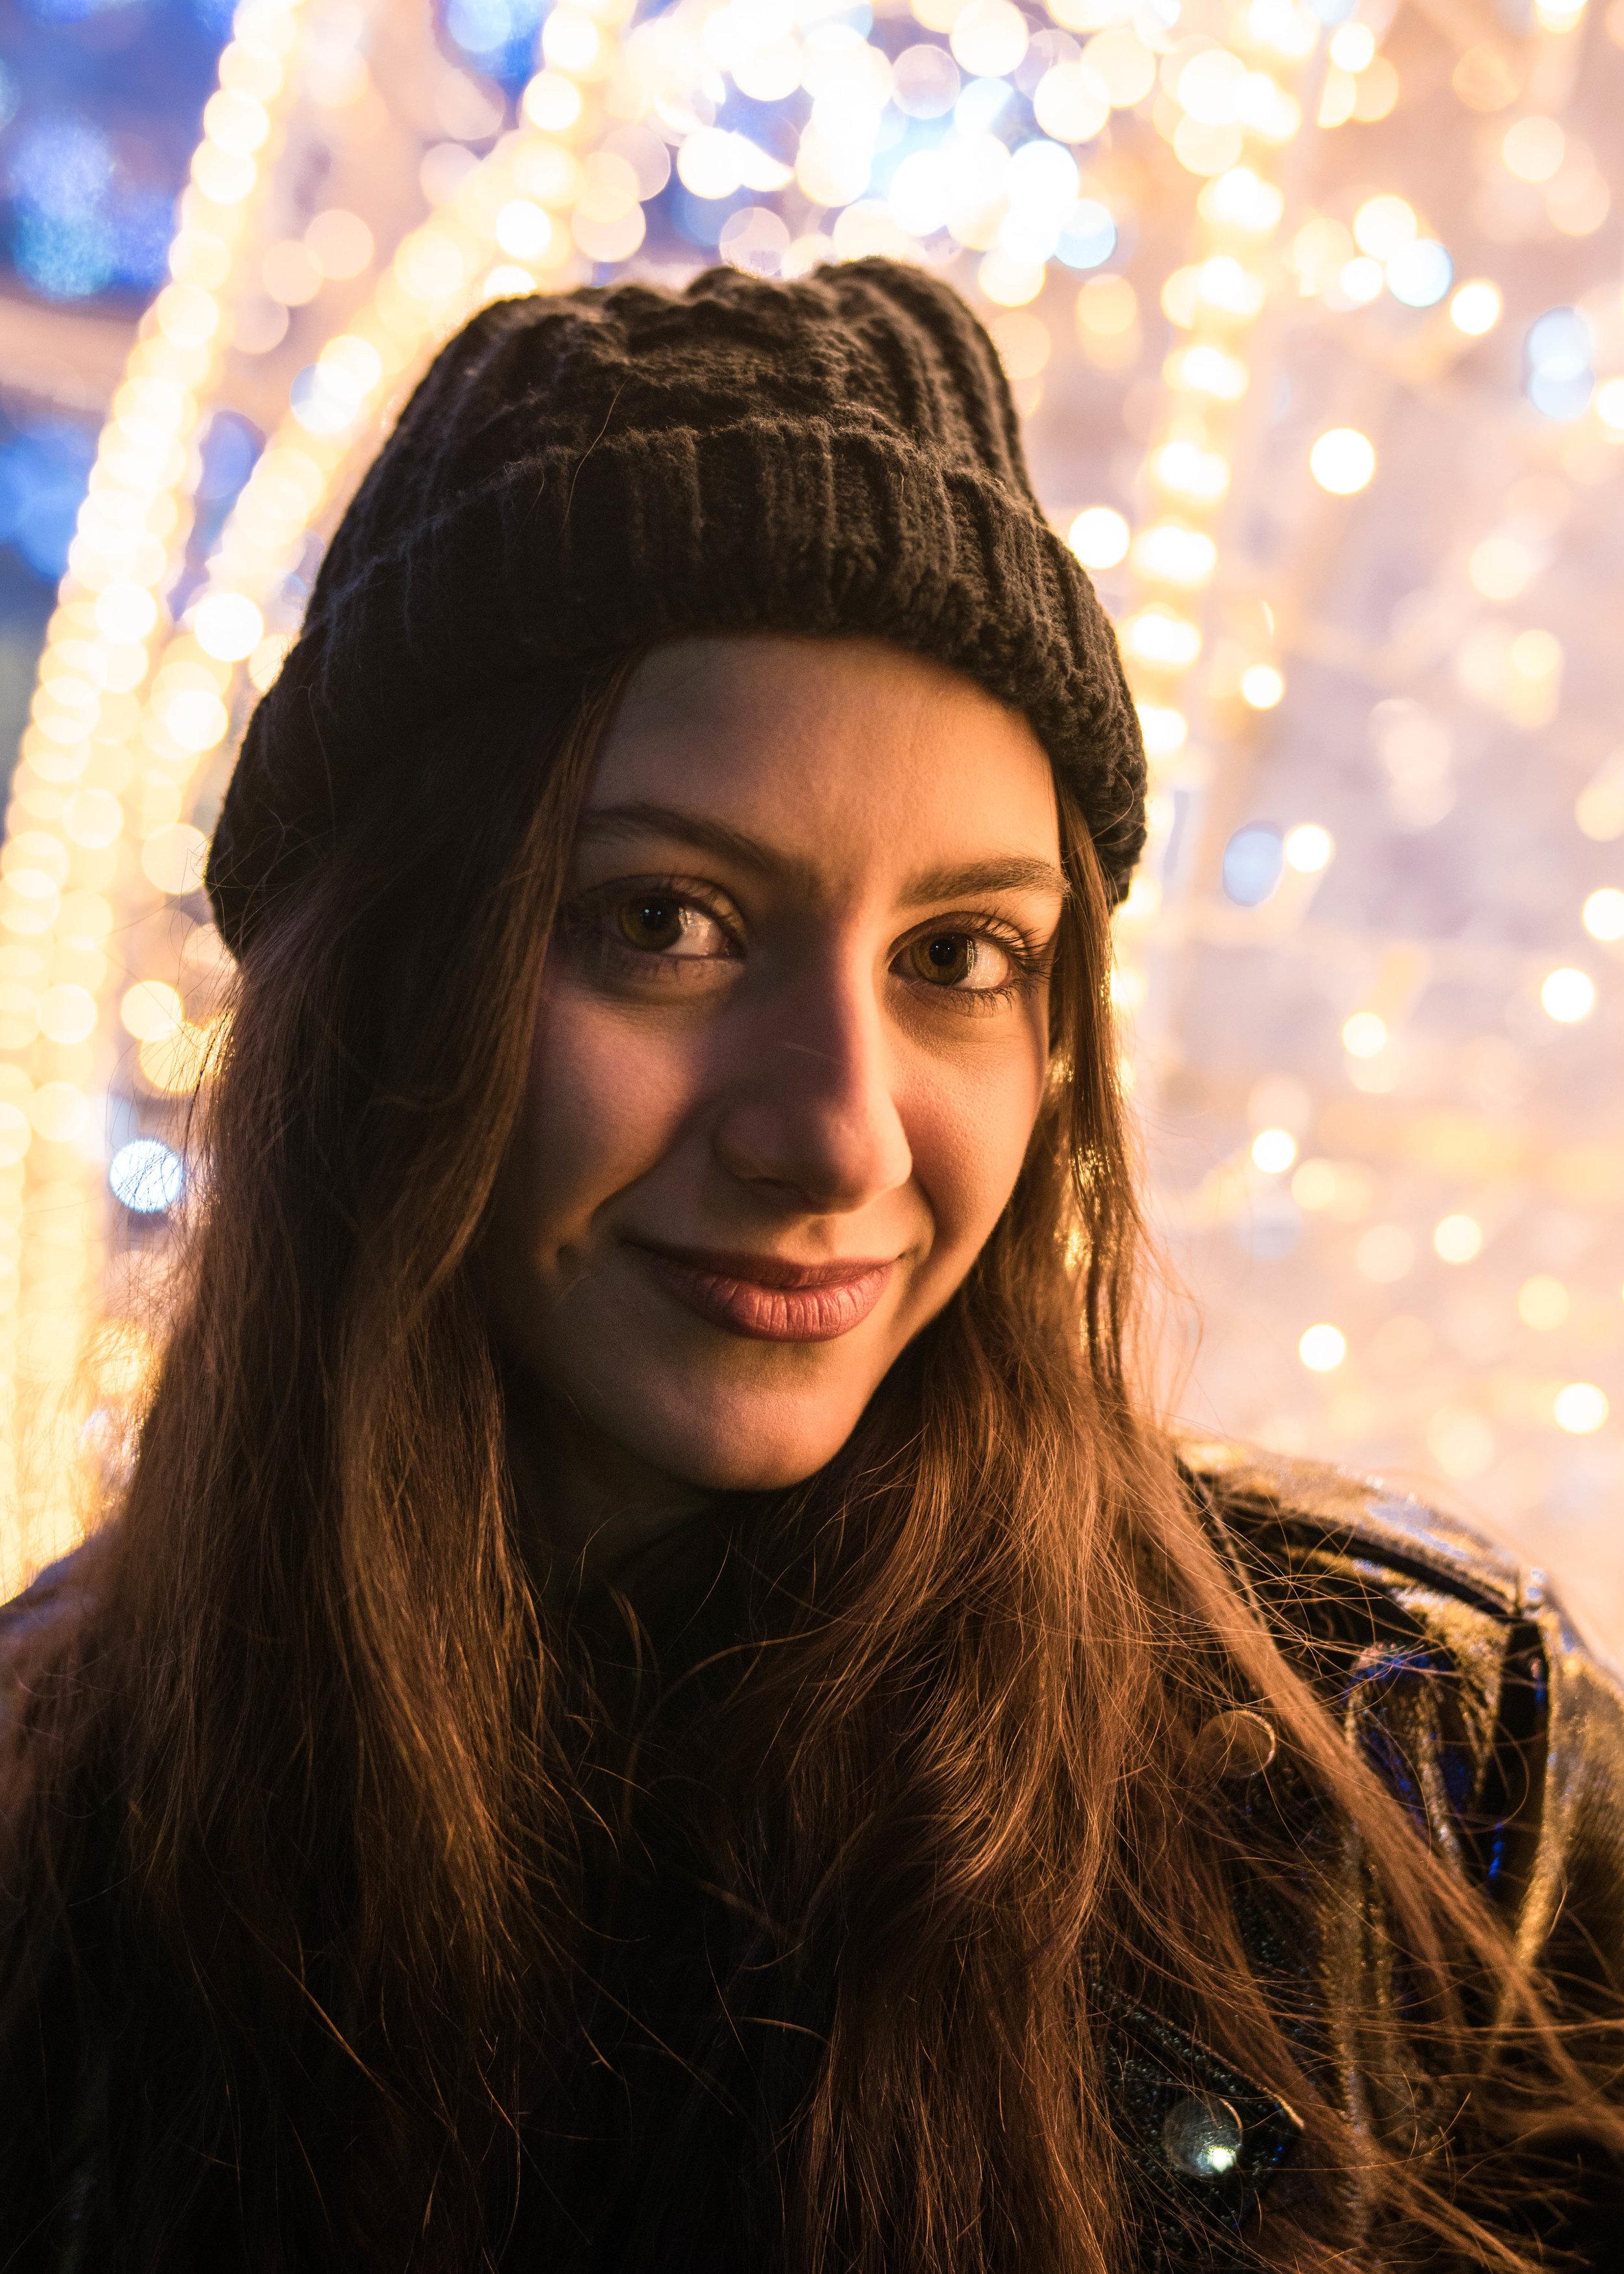 detroit photoshoot | holiday photos | holiday minisession | holiday lights | christmas lights | portrait session | Detroit portrait session